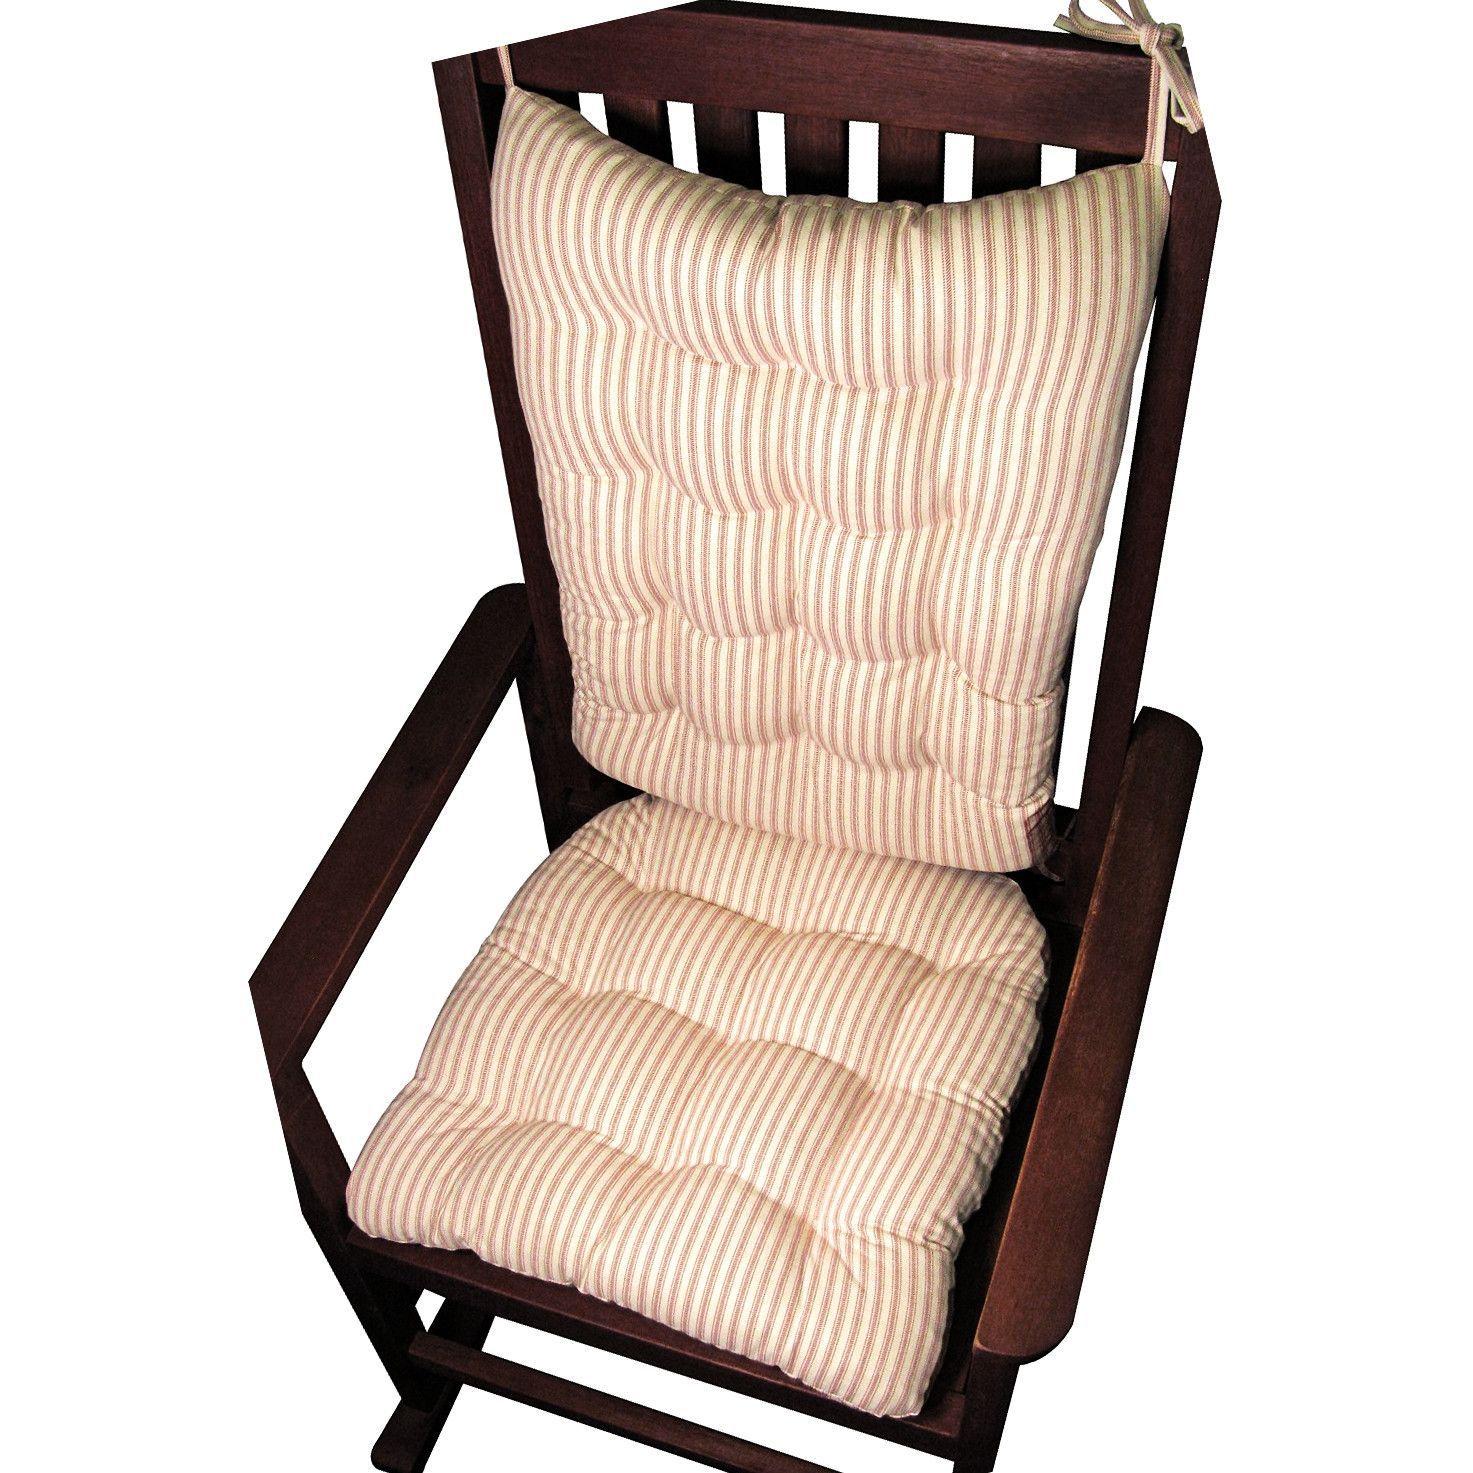 Ticking Stripe Red Rocking Chair Cushion Set   Latex Foam Fill